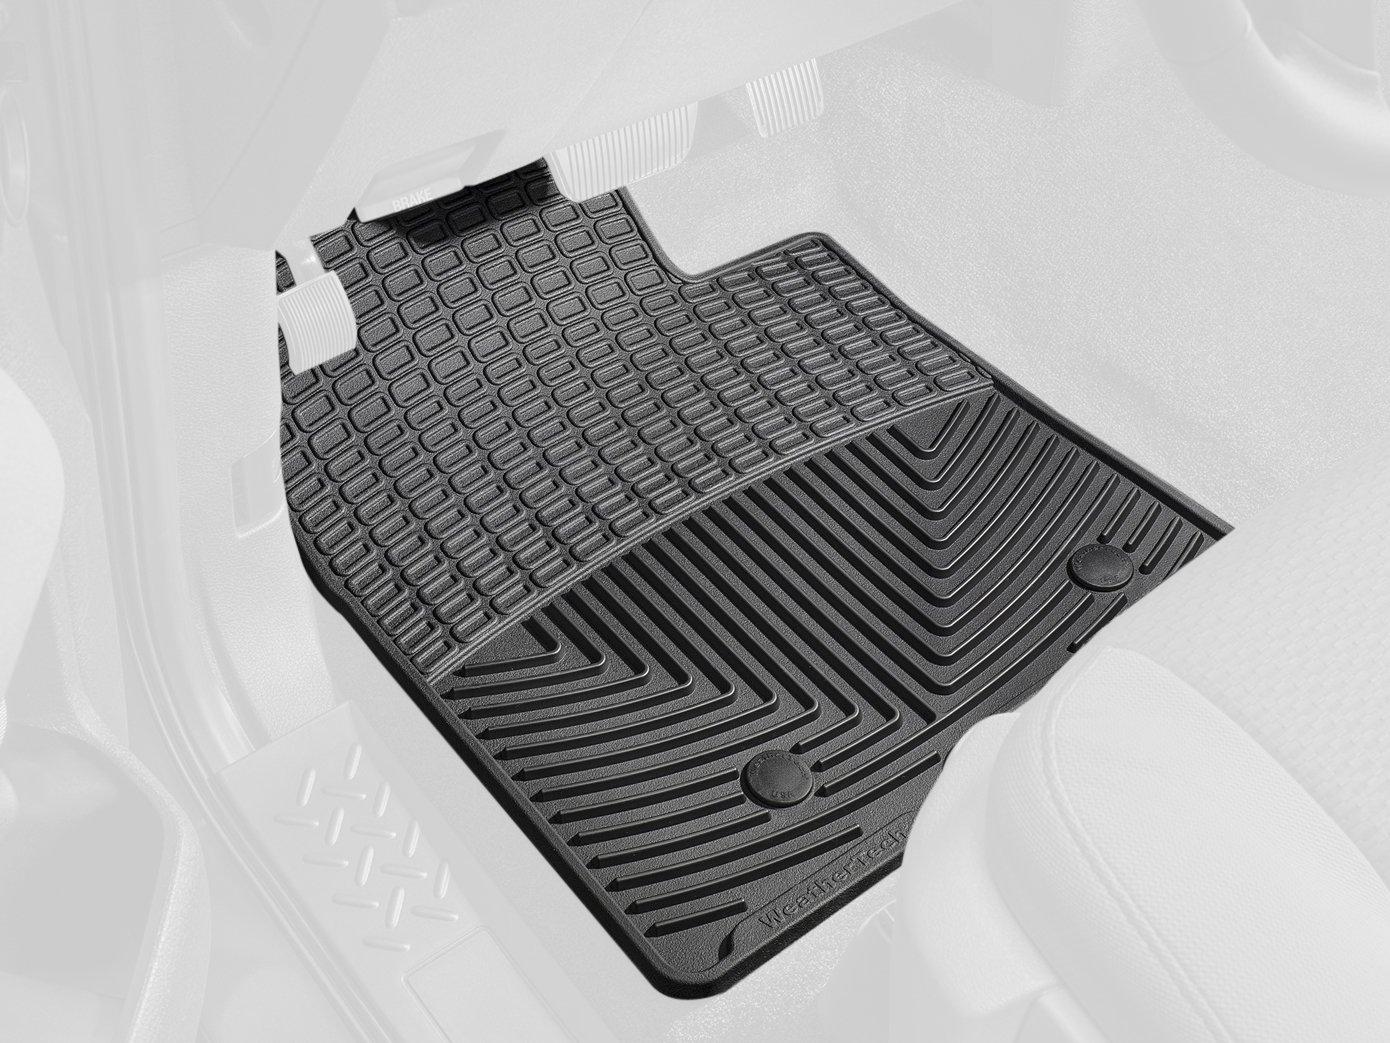 Weathertech floor mats acura tl - Amazon Com Weathertech Front Rubber Floor Mat For Select Acura Tl Tsx Models Automotive